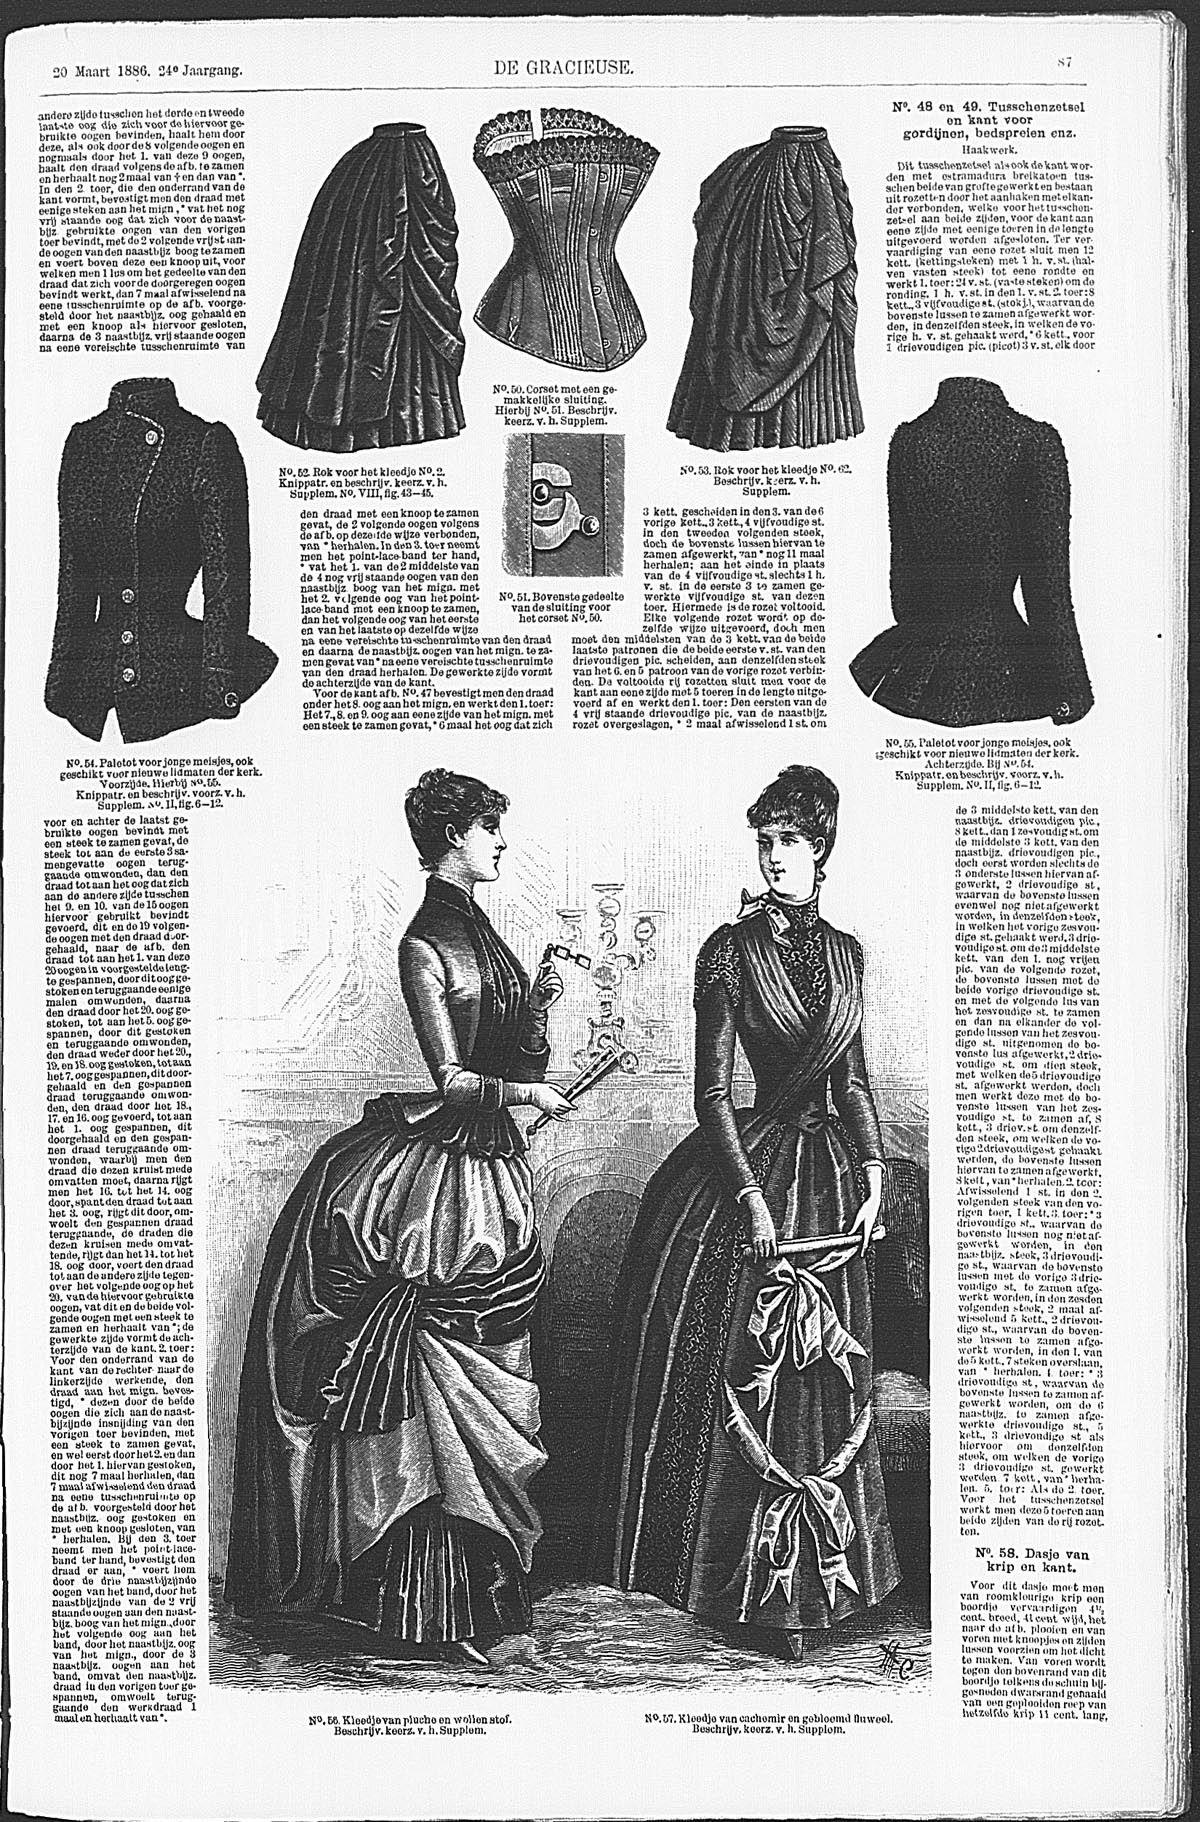 Gracieuse. Geïllustreerde Aglaja, 1886, aflevering 11, pagina 87